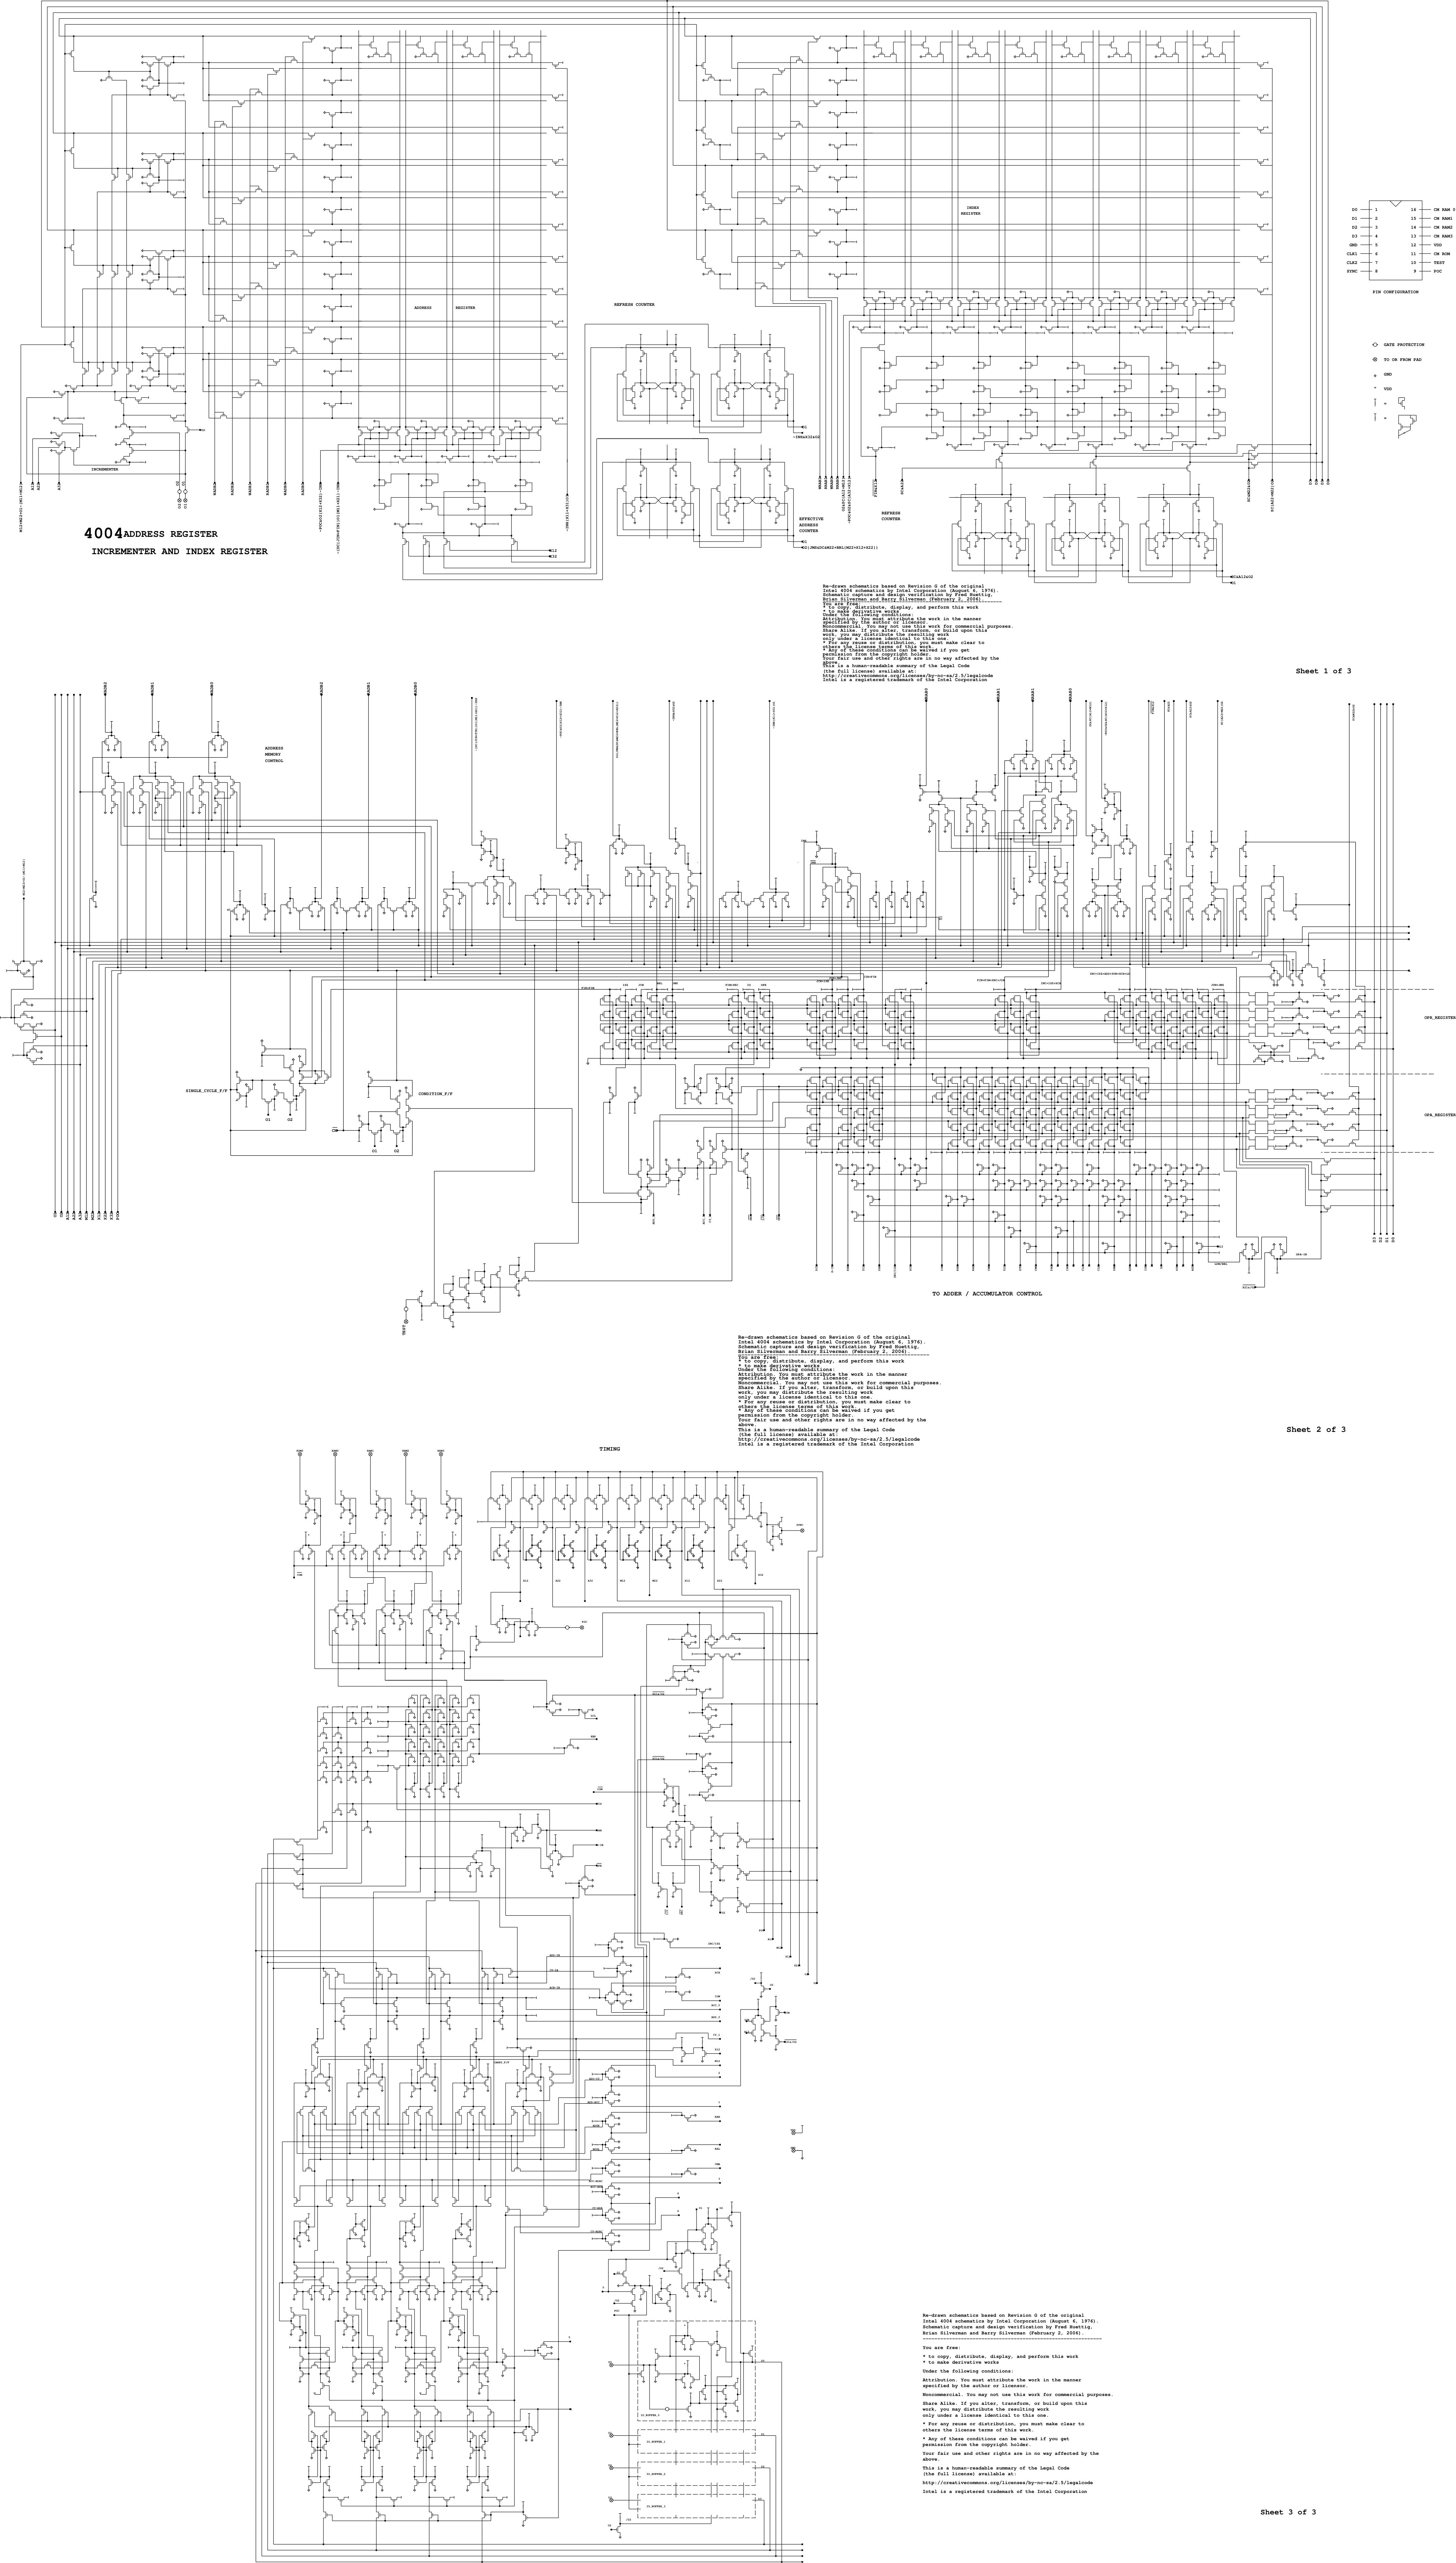 File:Intel-4004-schematics.png - Wikipedia